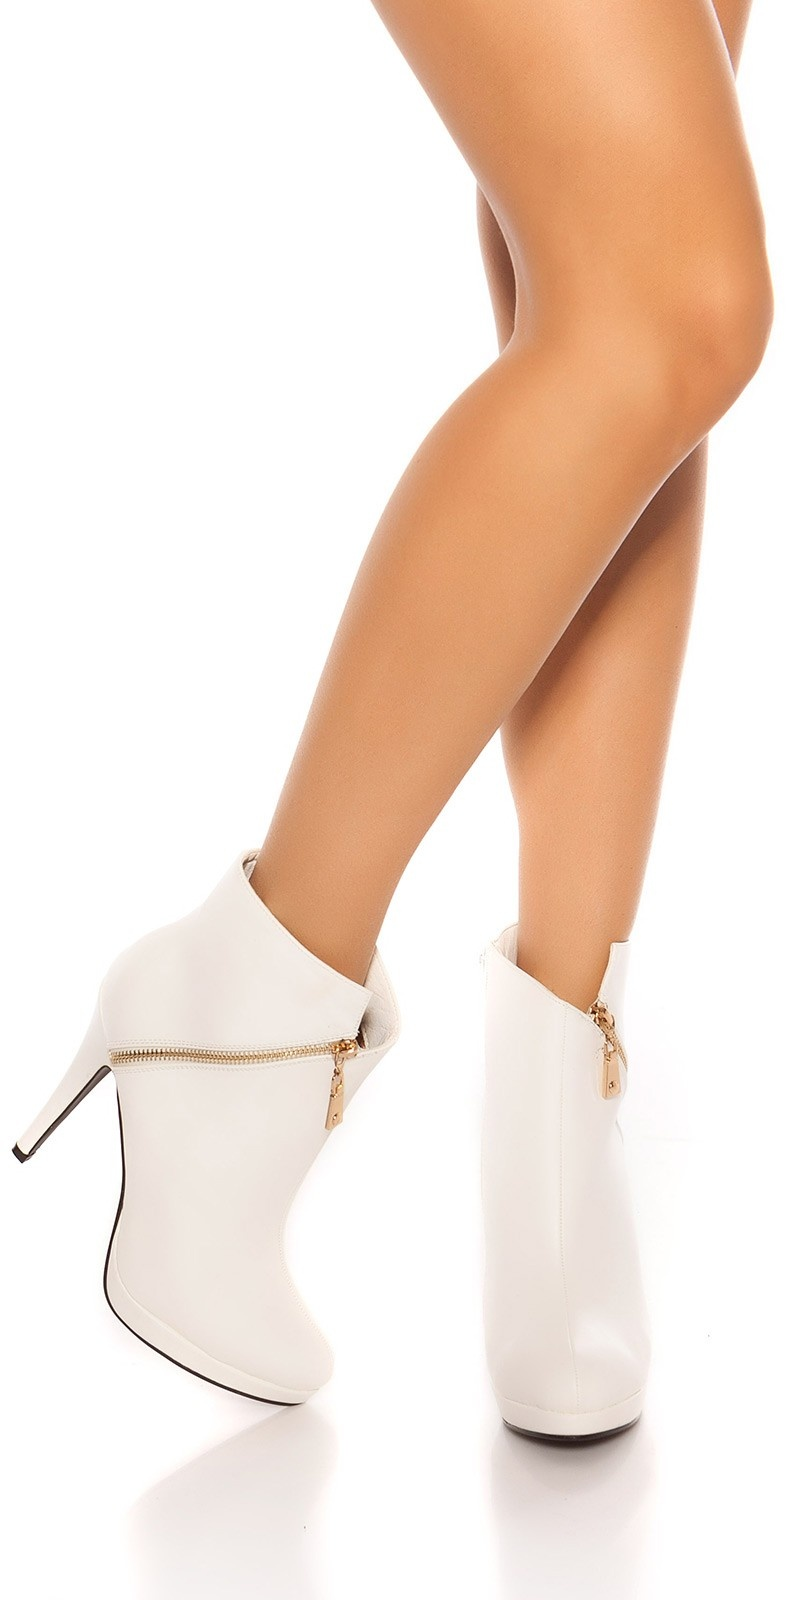 Sexy Stilett Ankle Boots White